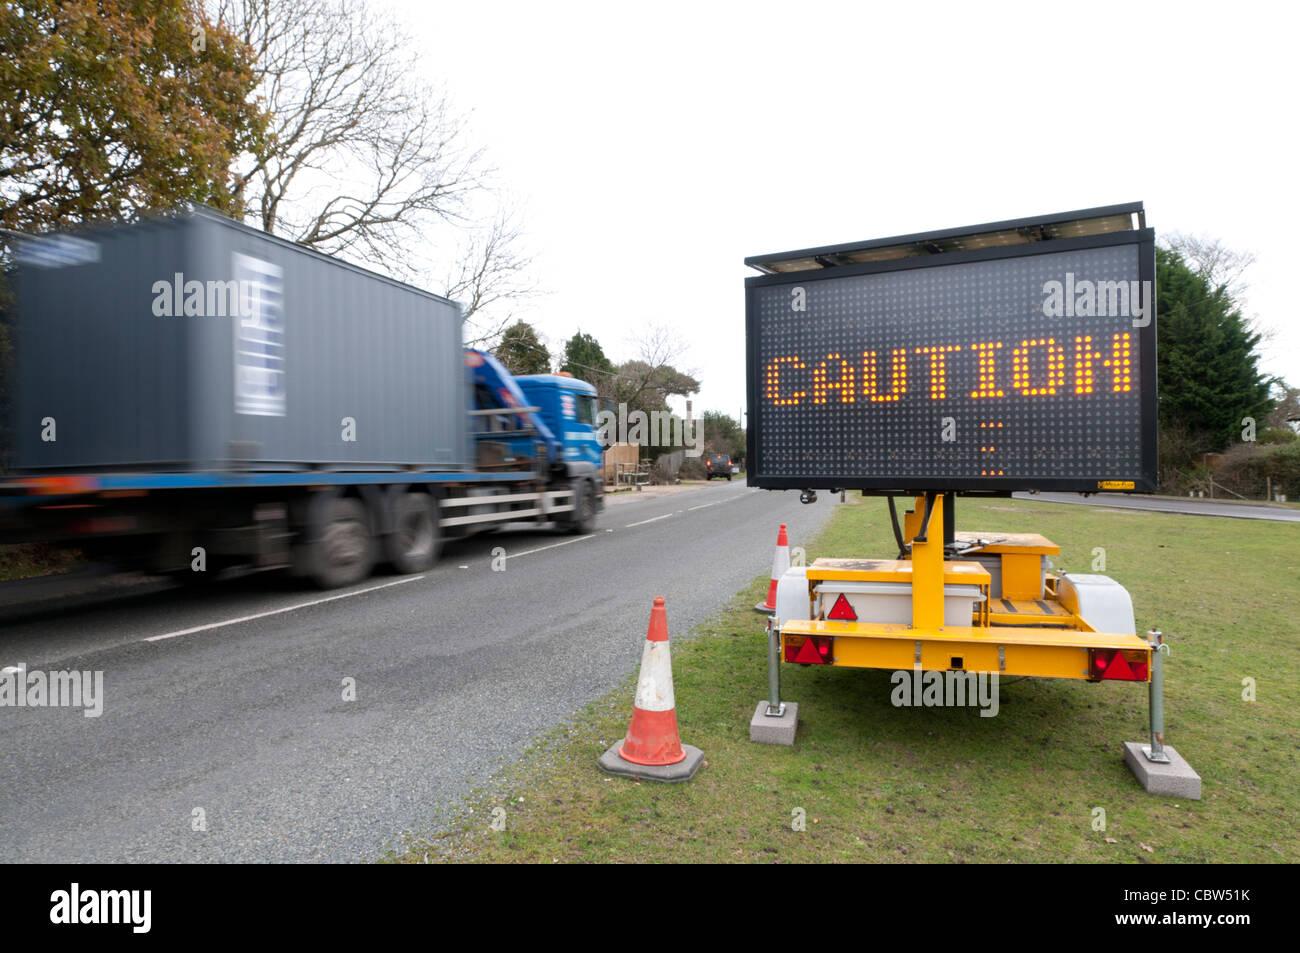 Mobile Matrix Road Sign - Stock Image